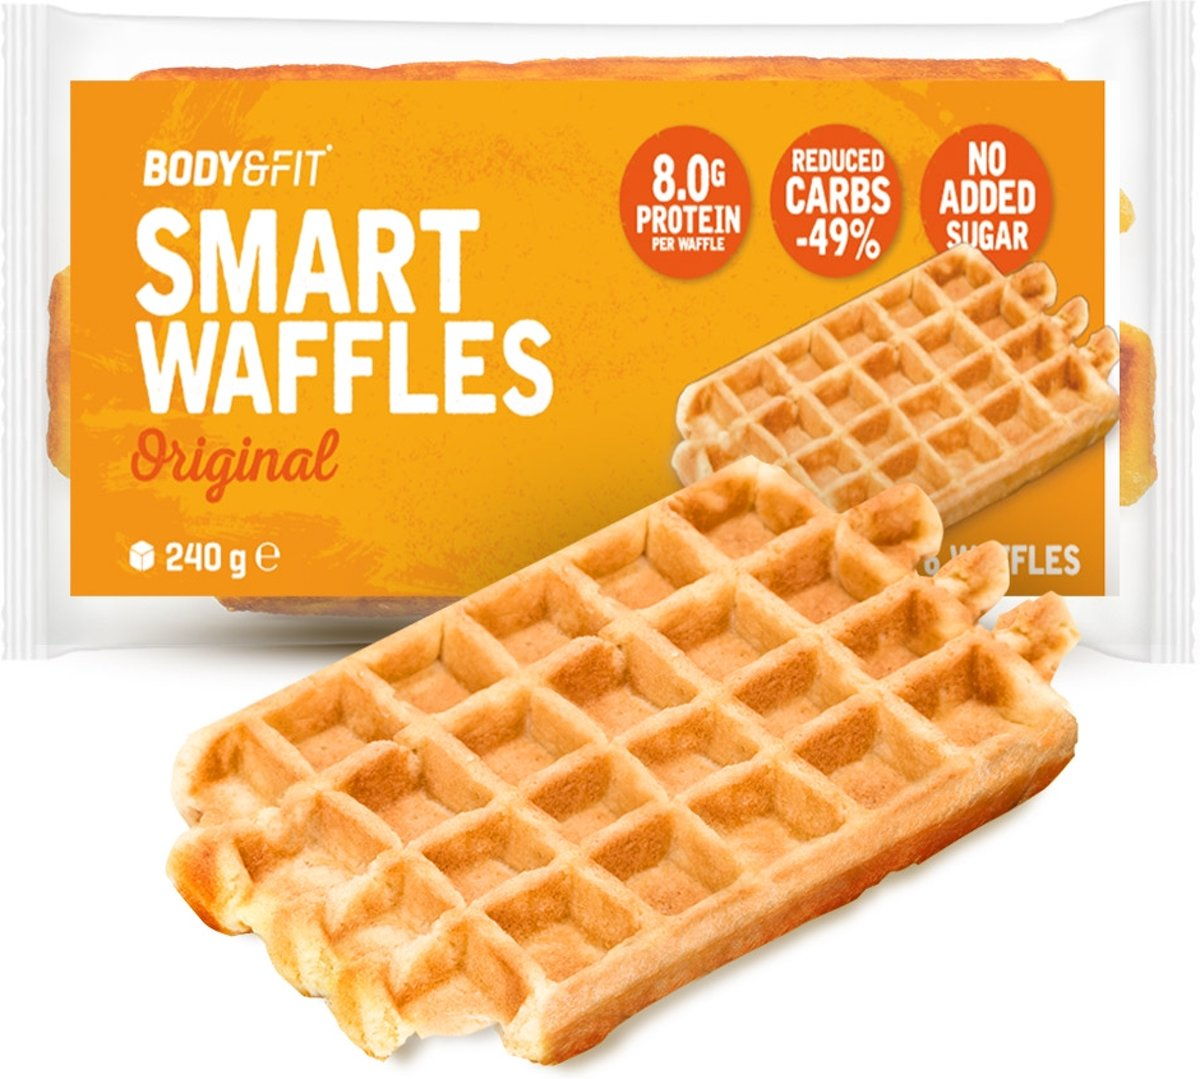 Body & Fit Smart Waffles - Eiwitrijk & Suikerarm - 1 pak (6 wafels) - Original kopen